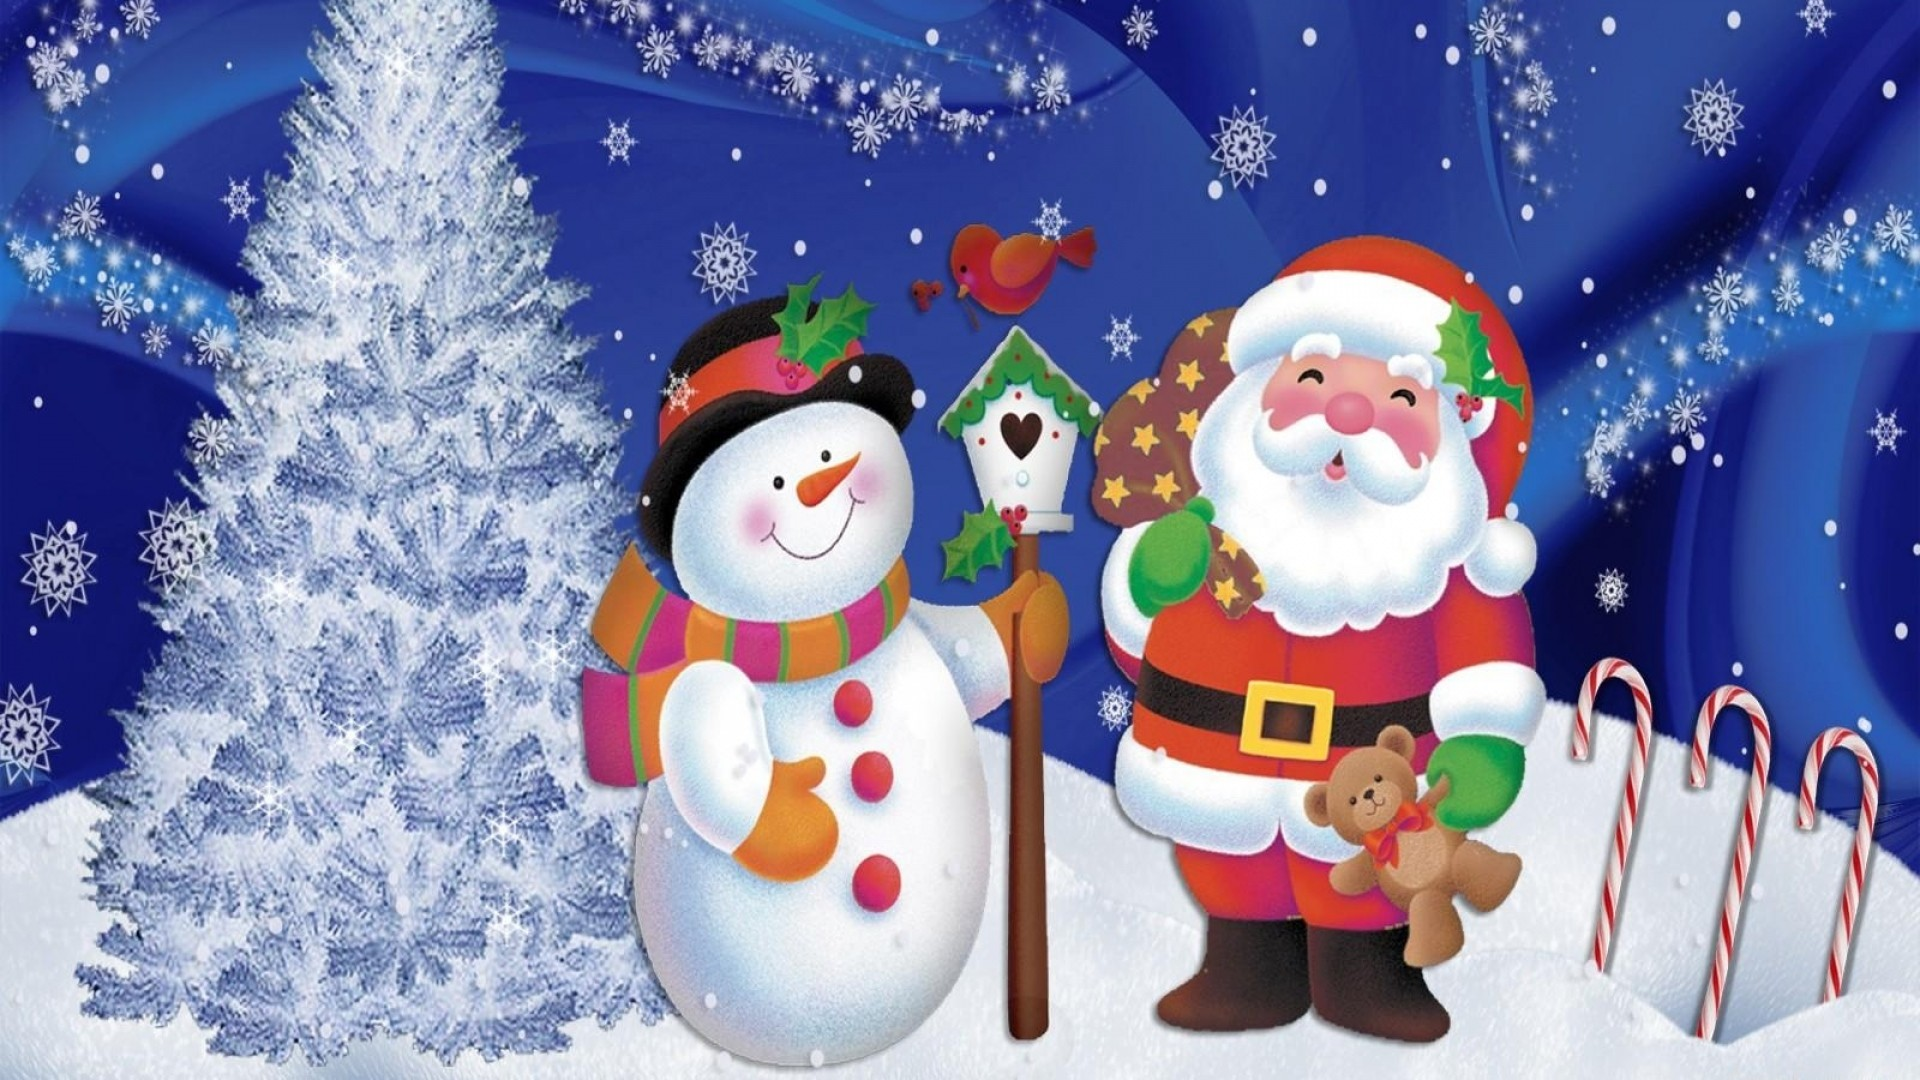 Wallpaper santa claus, snowman, christmas, tree, snowflakes,  postcard